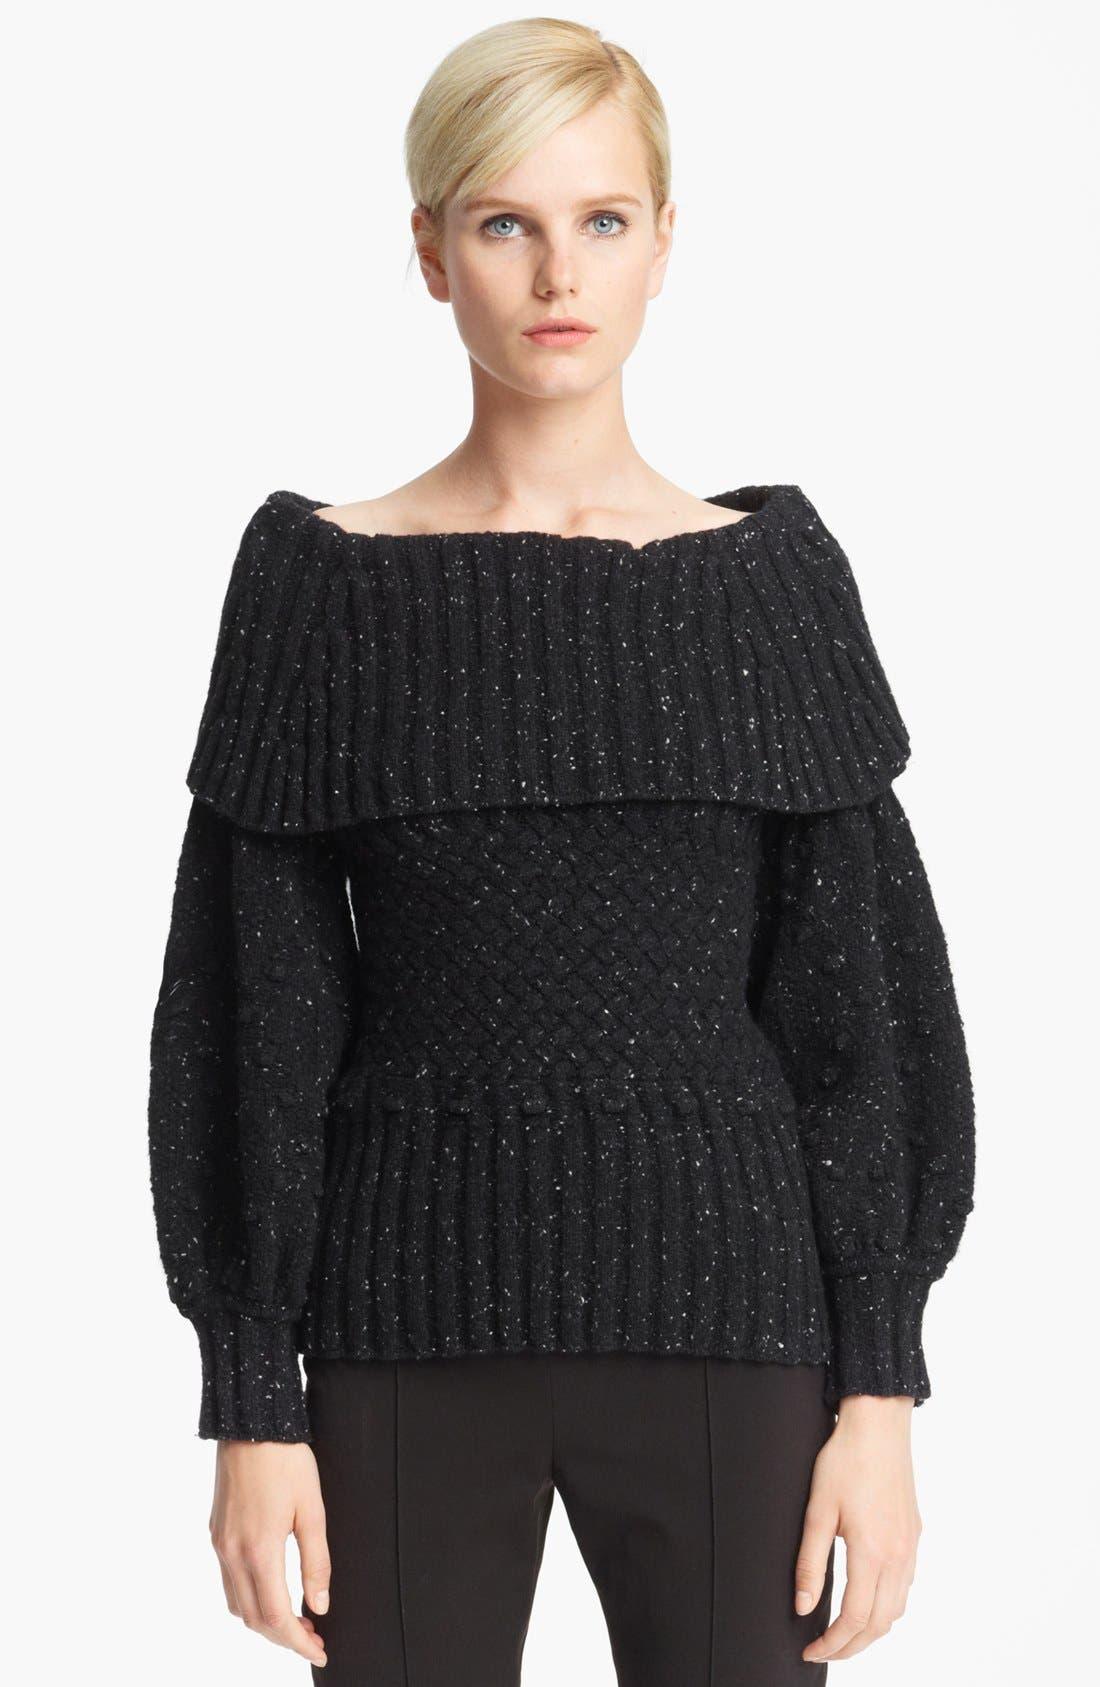 Alternate Image 1 Selected - Oscar de la Renta Ribbed Sweater